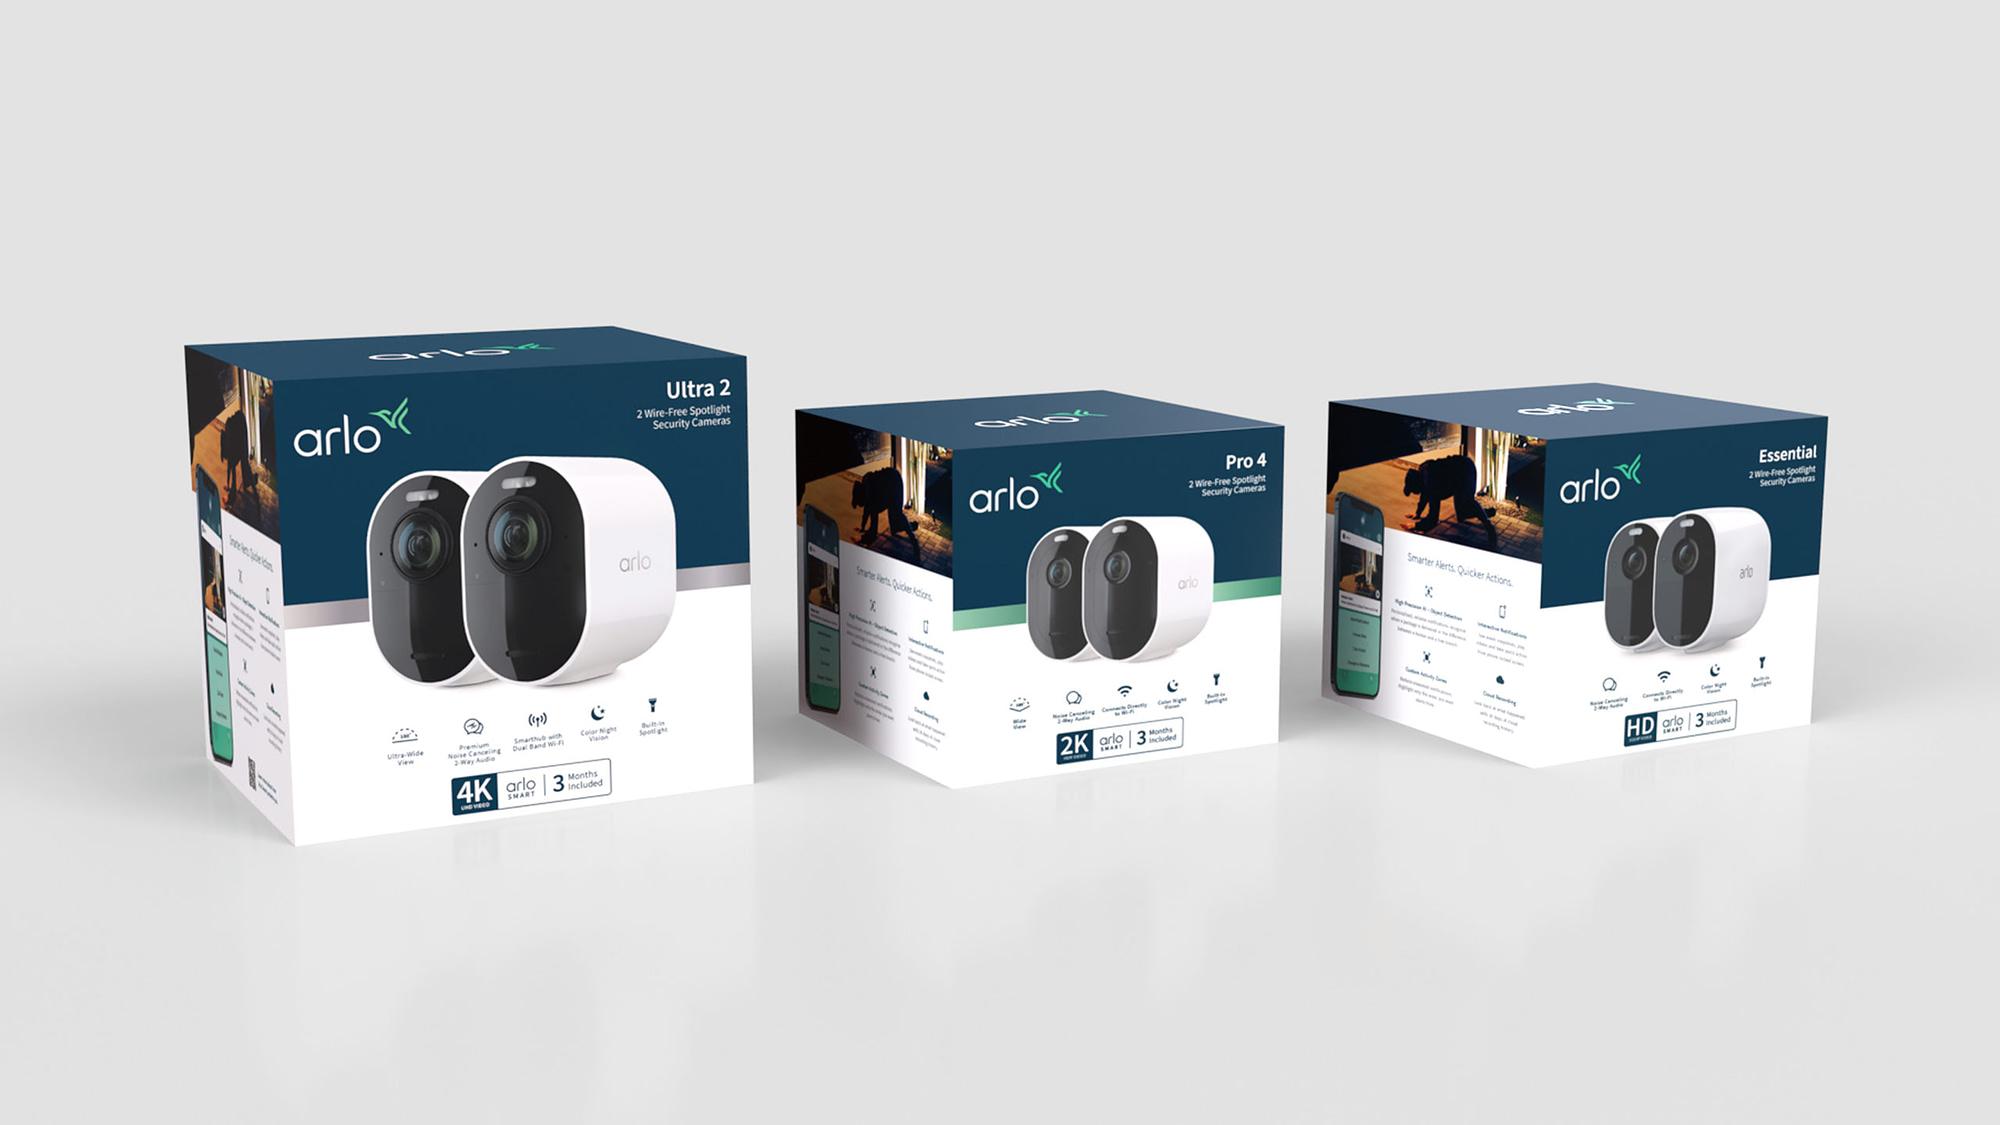 3D render of 3 Arlo security camera boxes, showcasing Arlo rebrand and new packaging design.